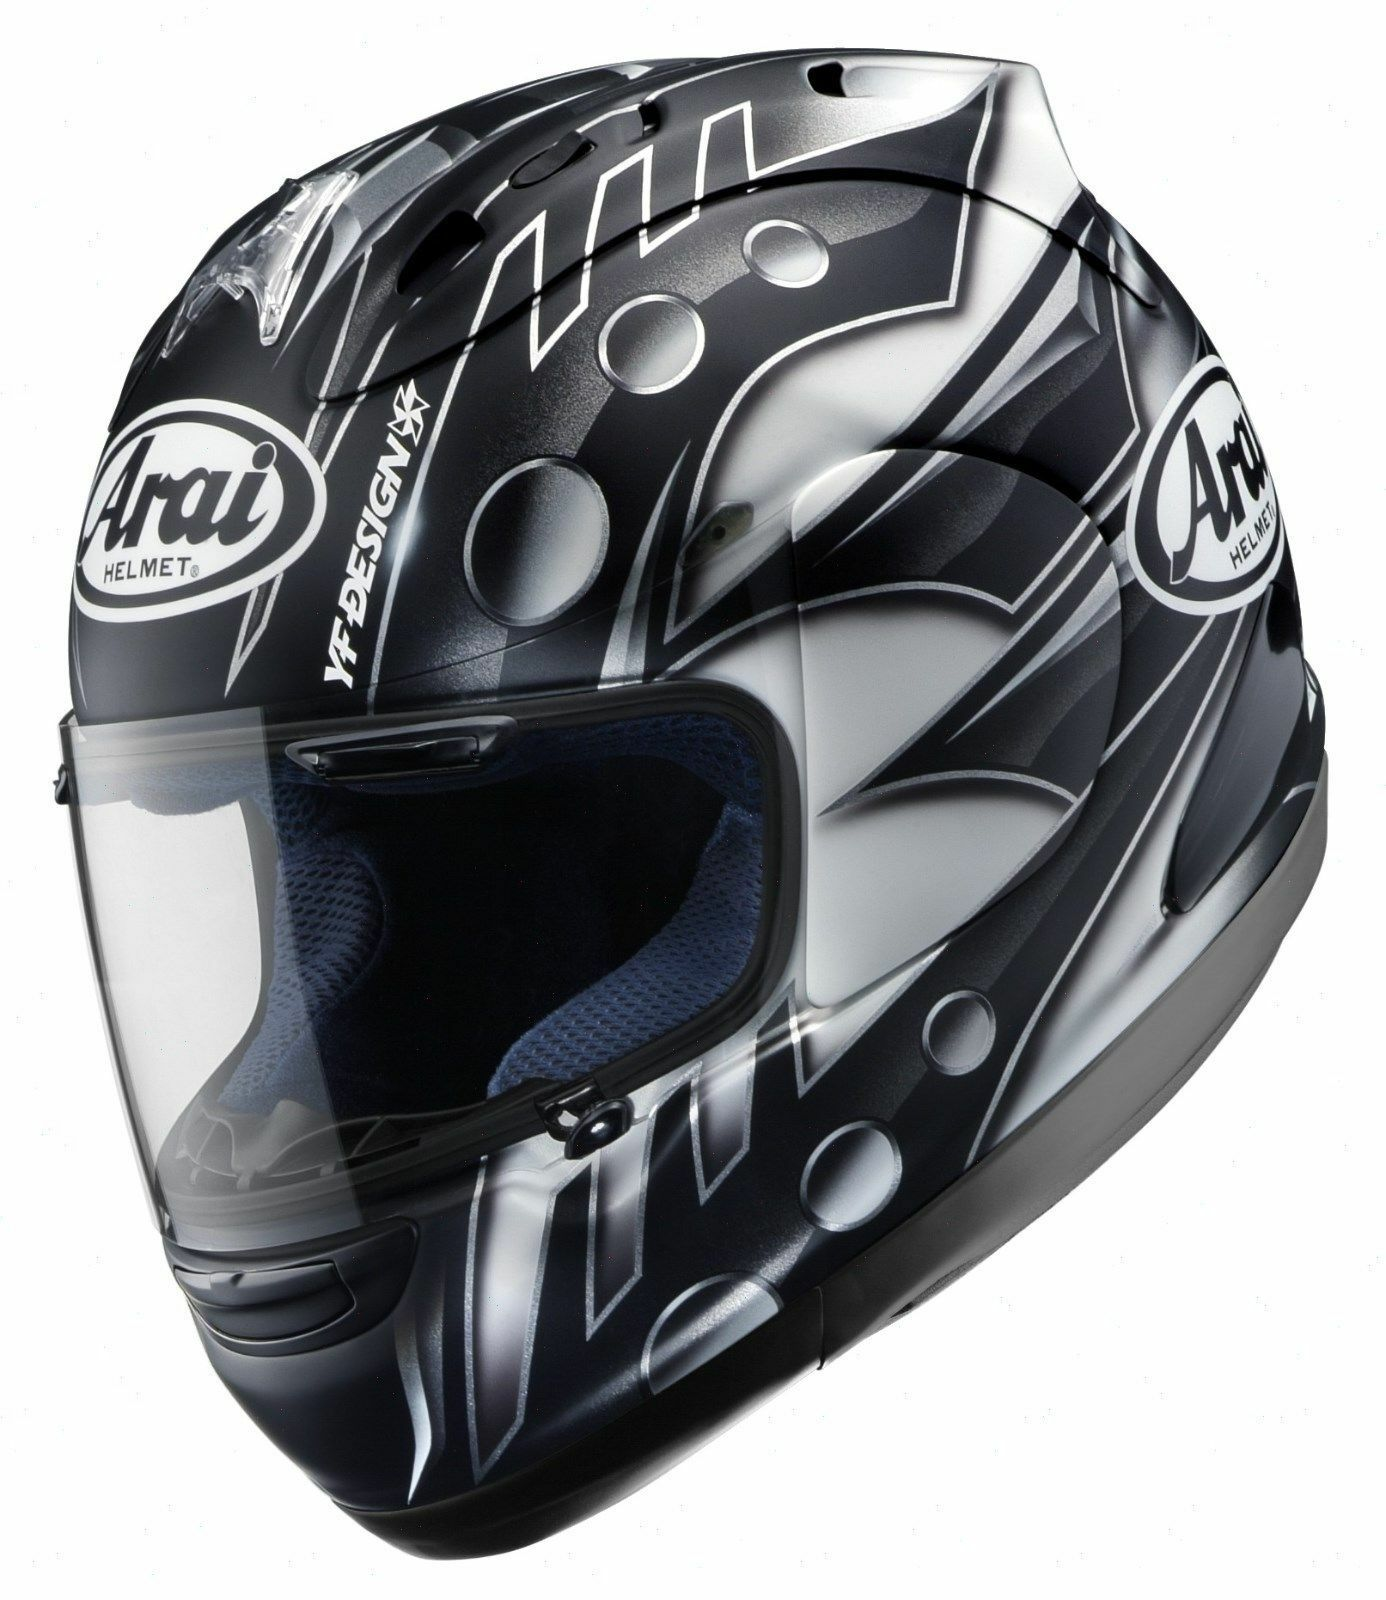 Top 10 Safest Motorcycle Helmets | eBay